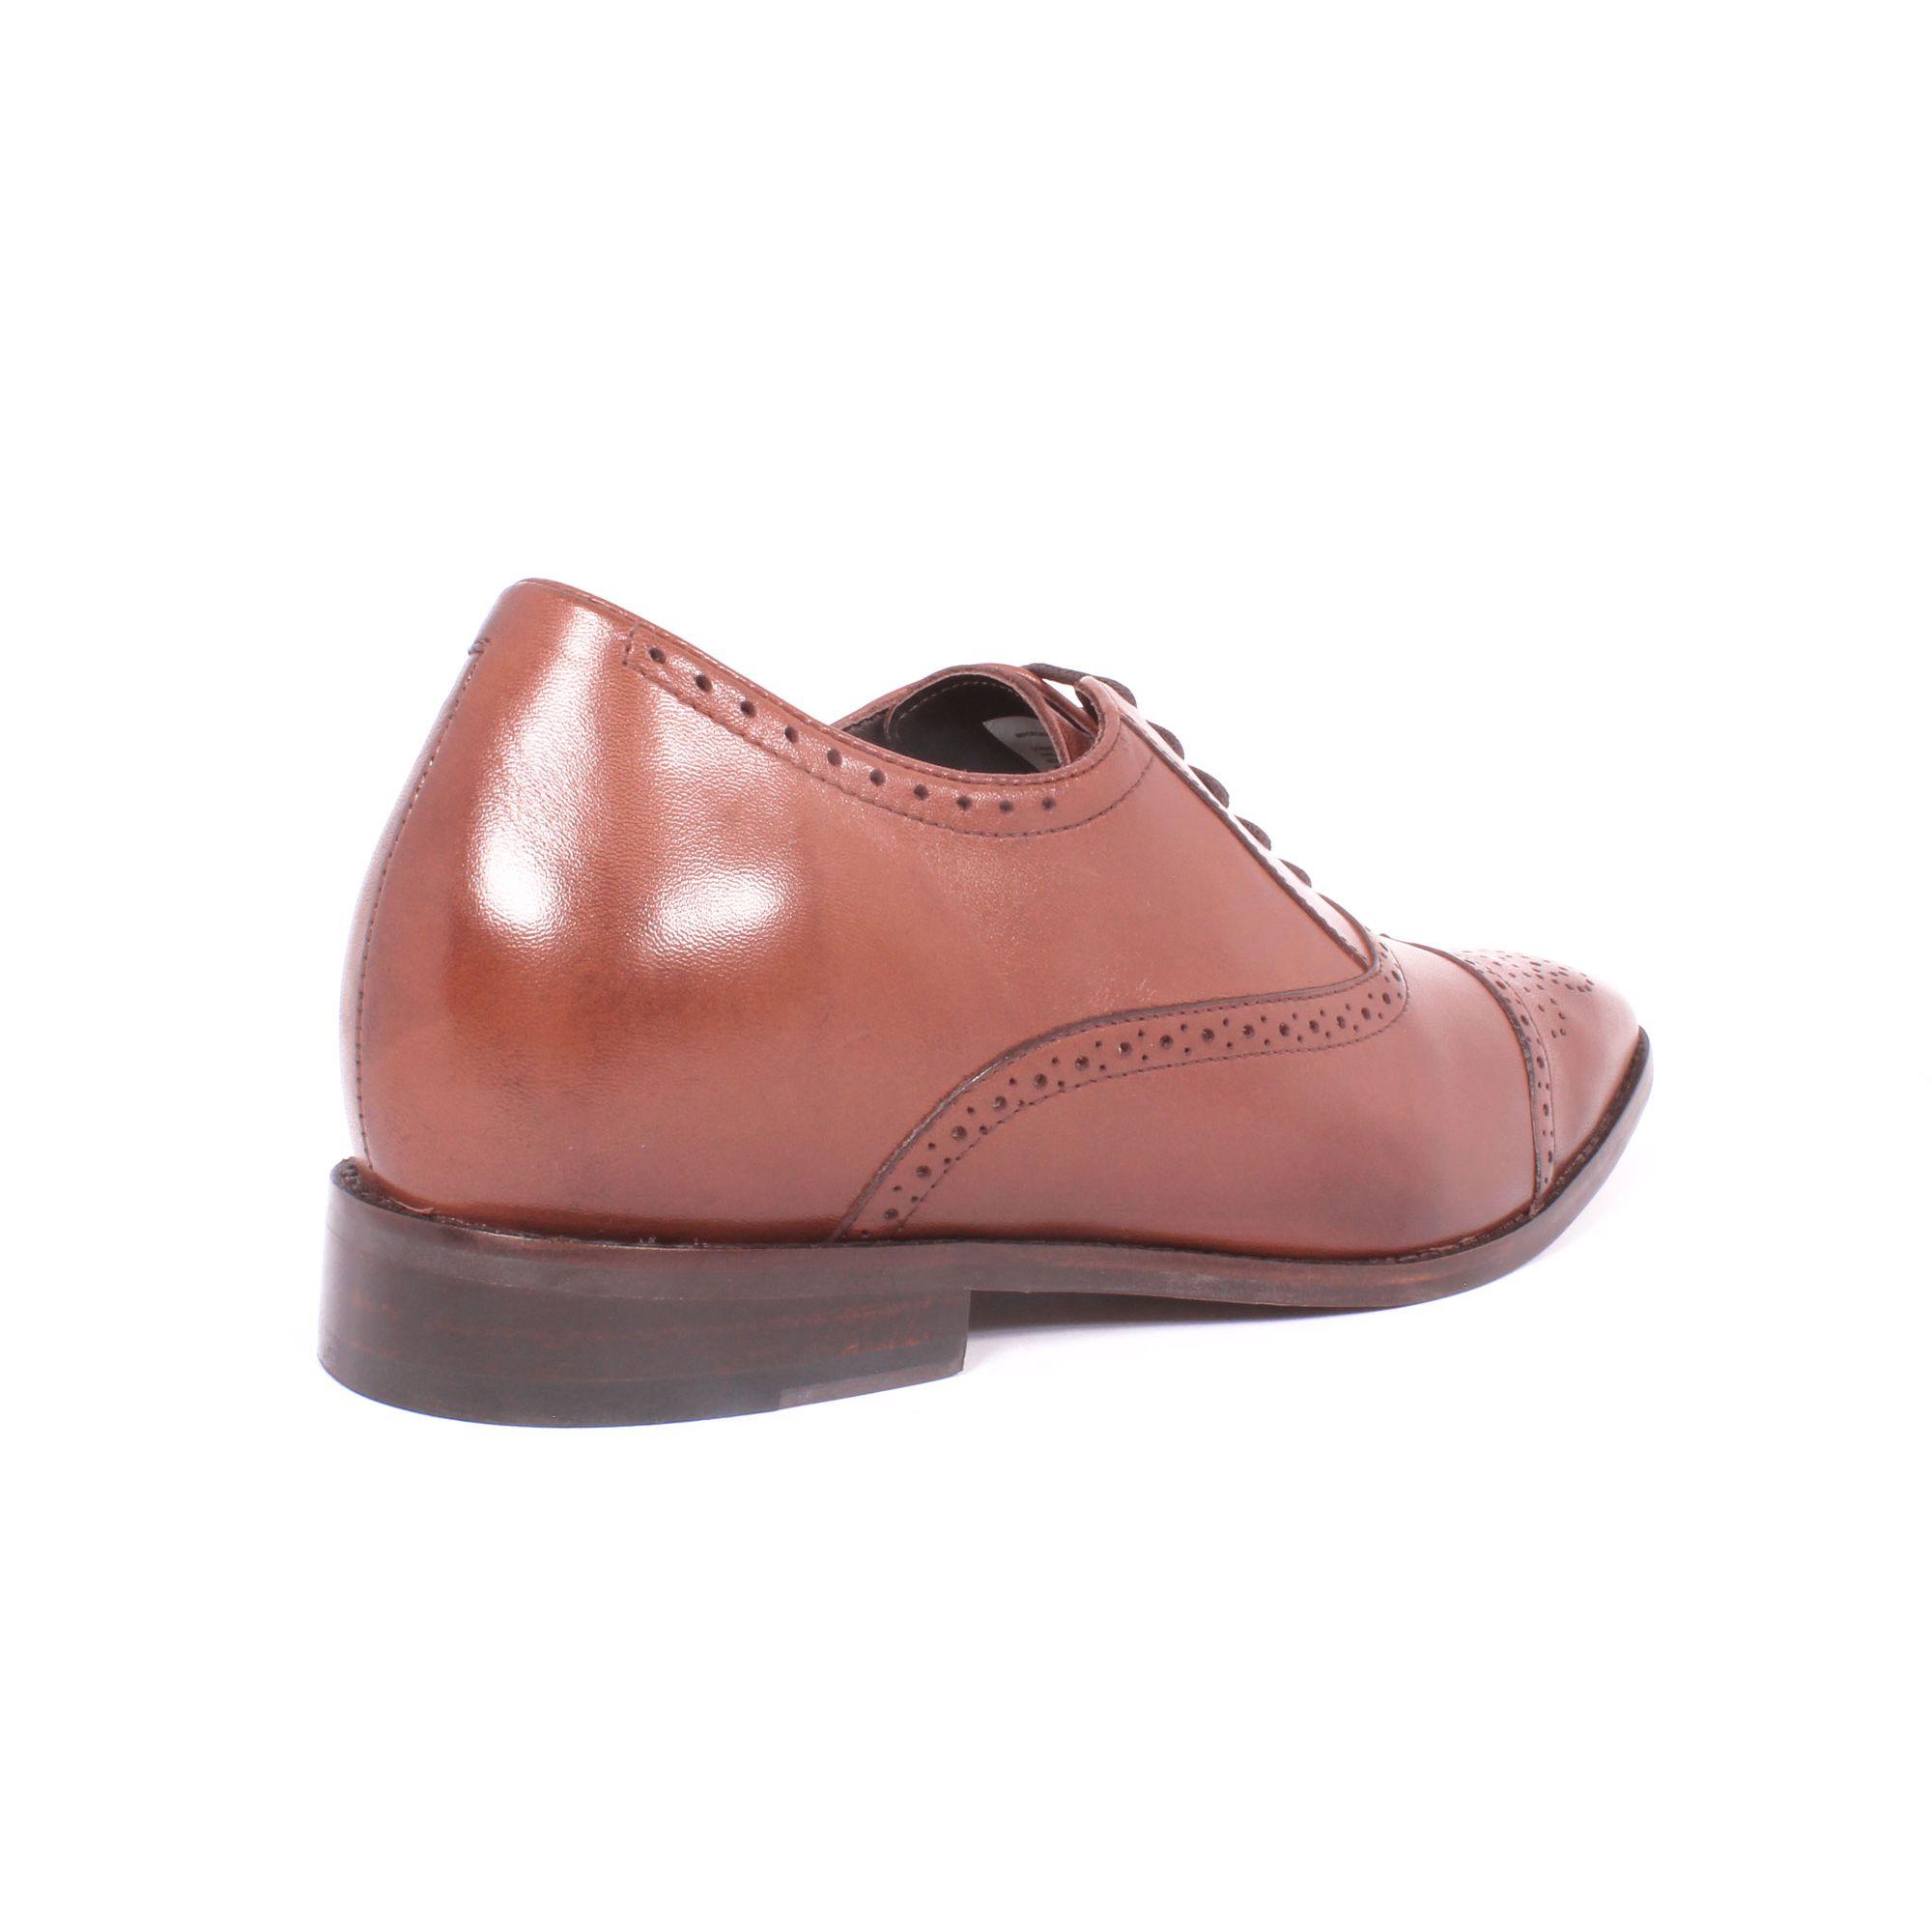 Zapato Formal British Café Max Denegri +7cms de Altura_70785